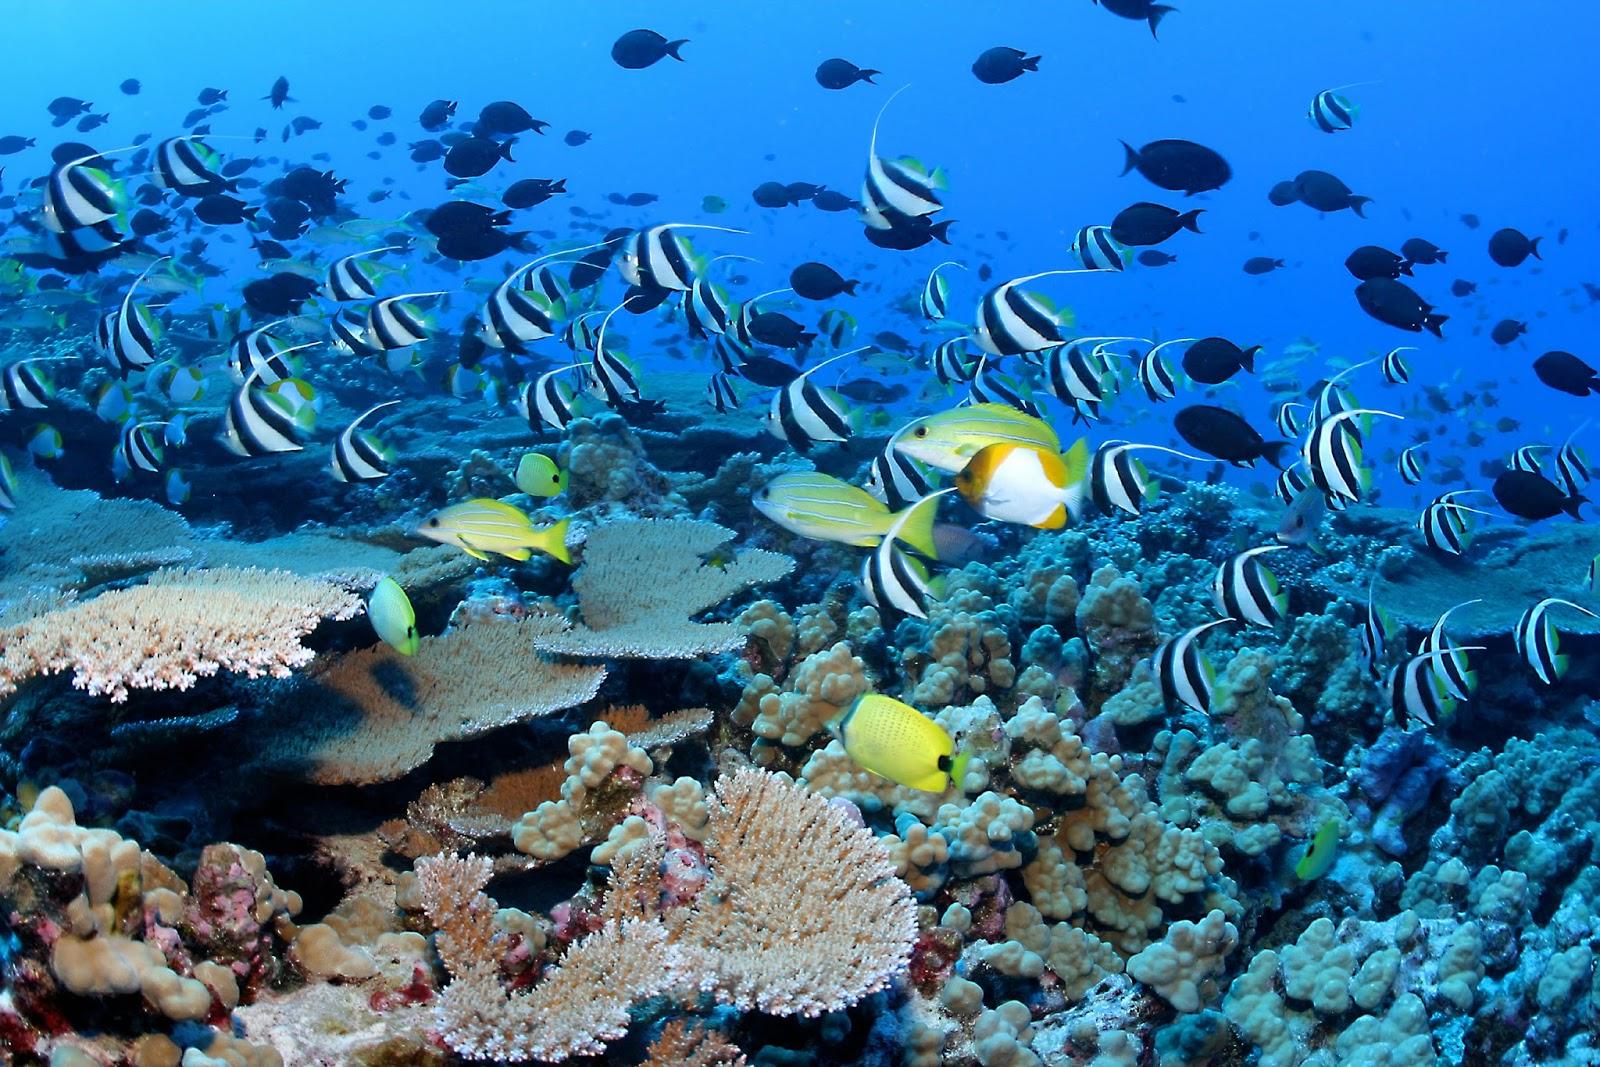 Ciencias de Joseleg Ecosistemas de agua salada arrecifes de coral